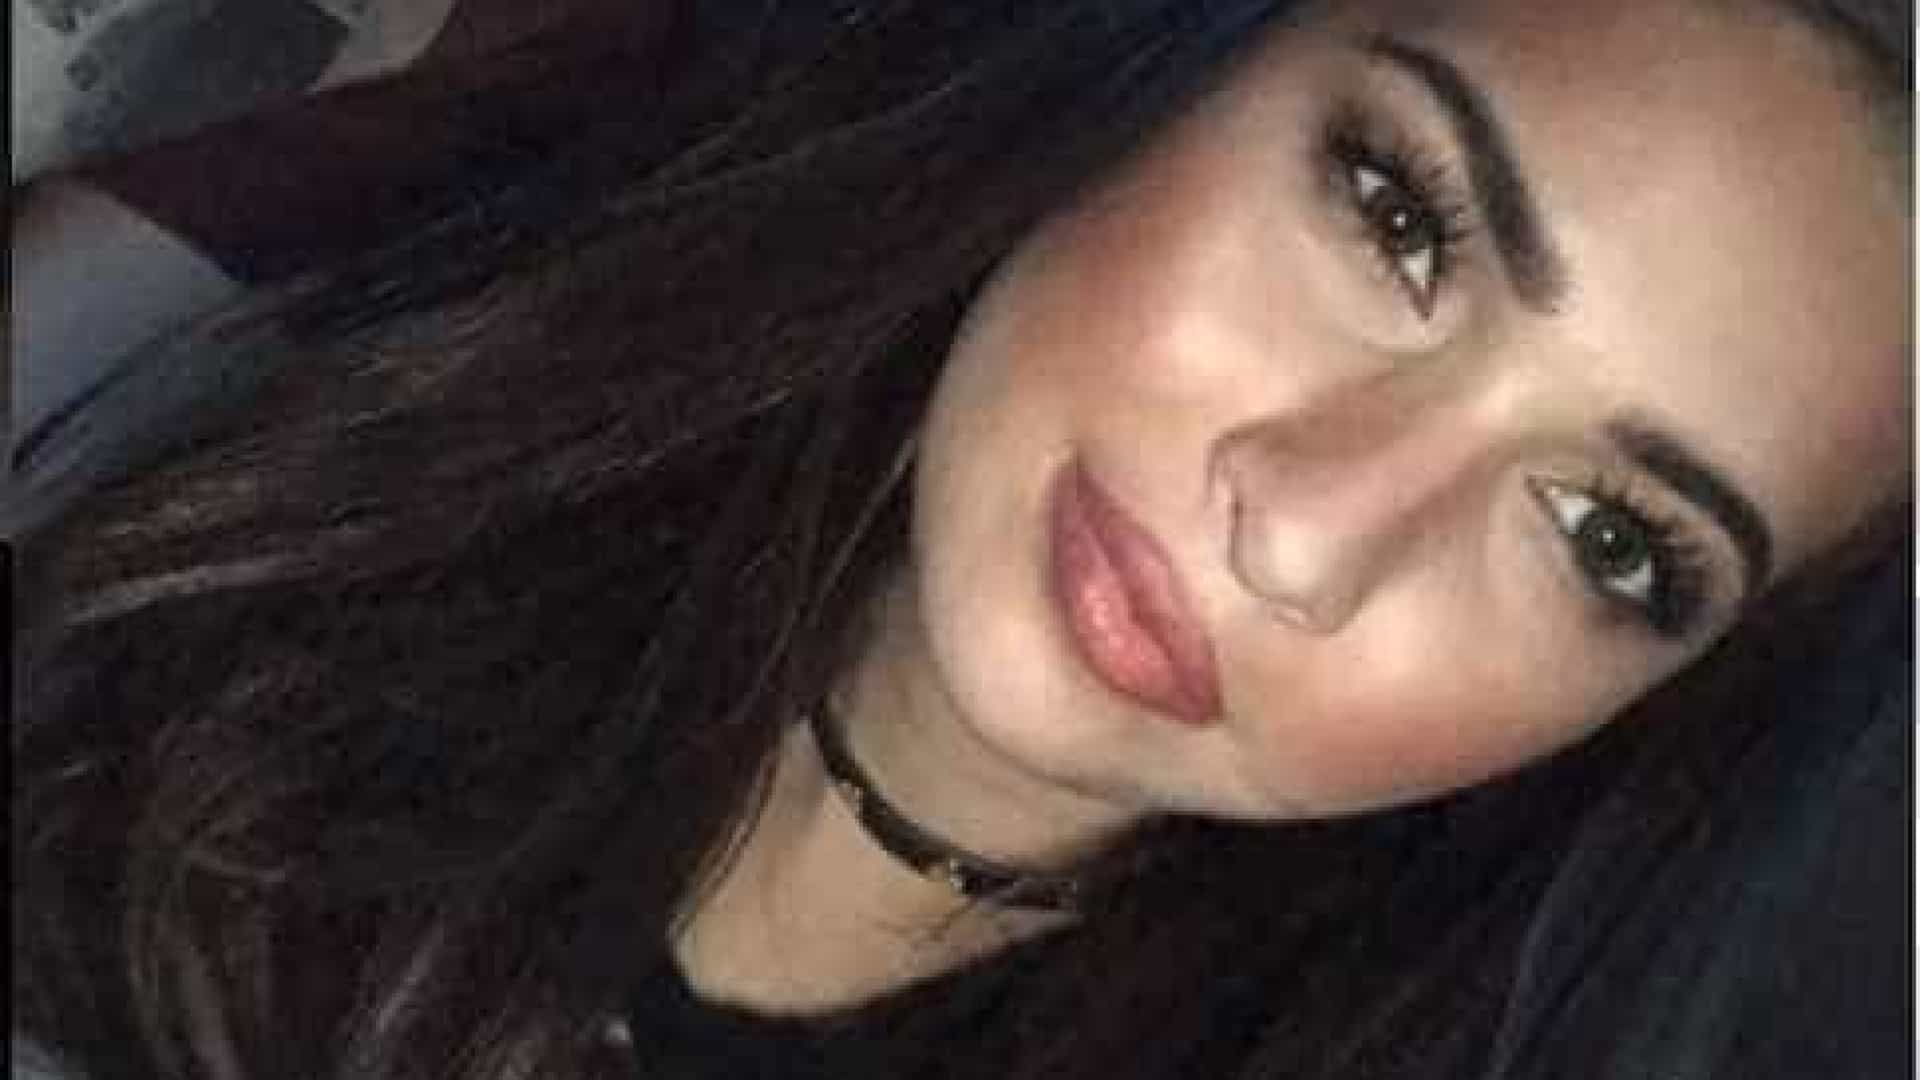 Família de estrela porno encontrada morta pede ajuda para trasladar corpo